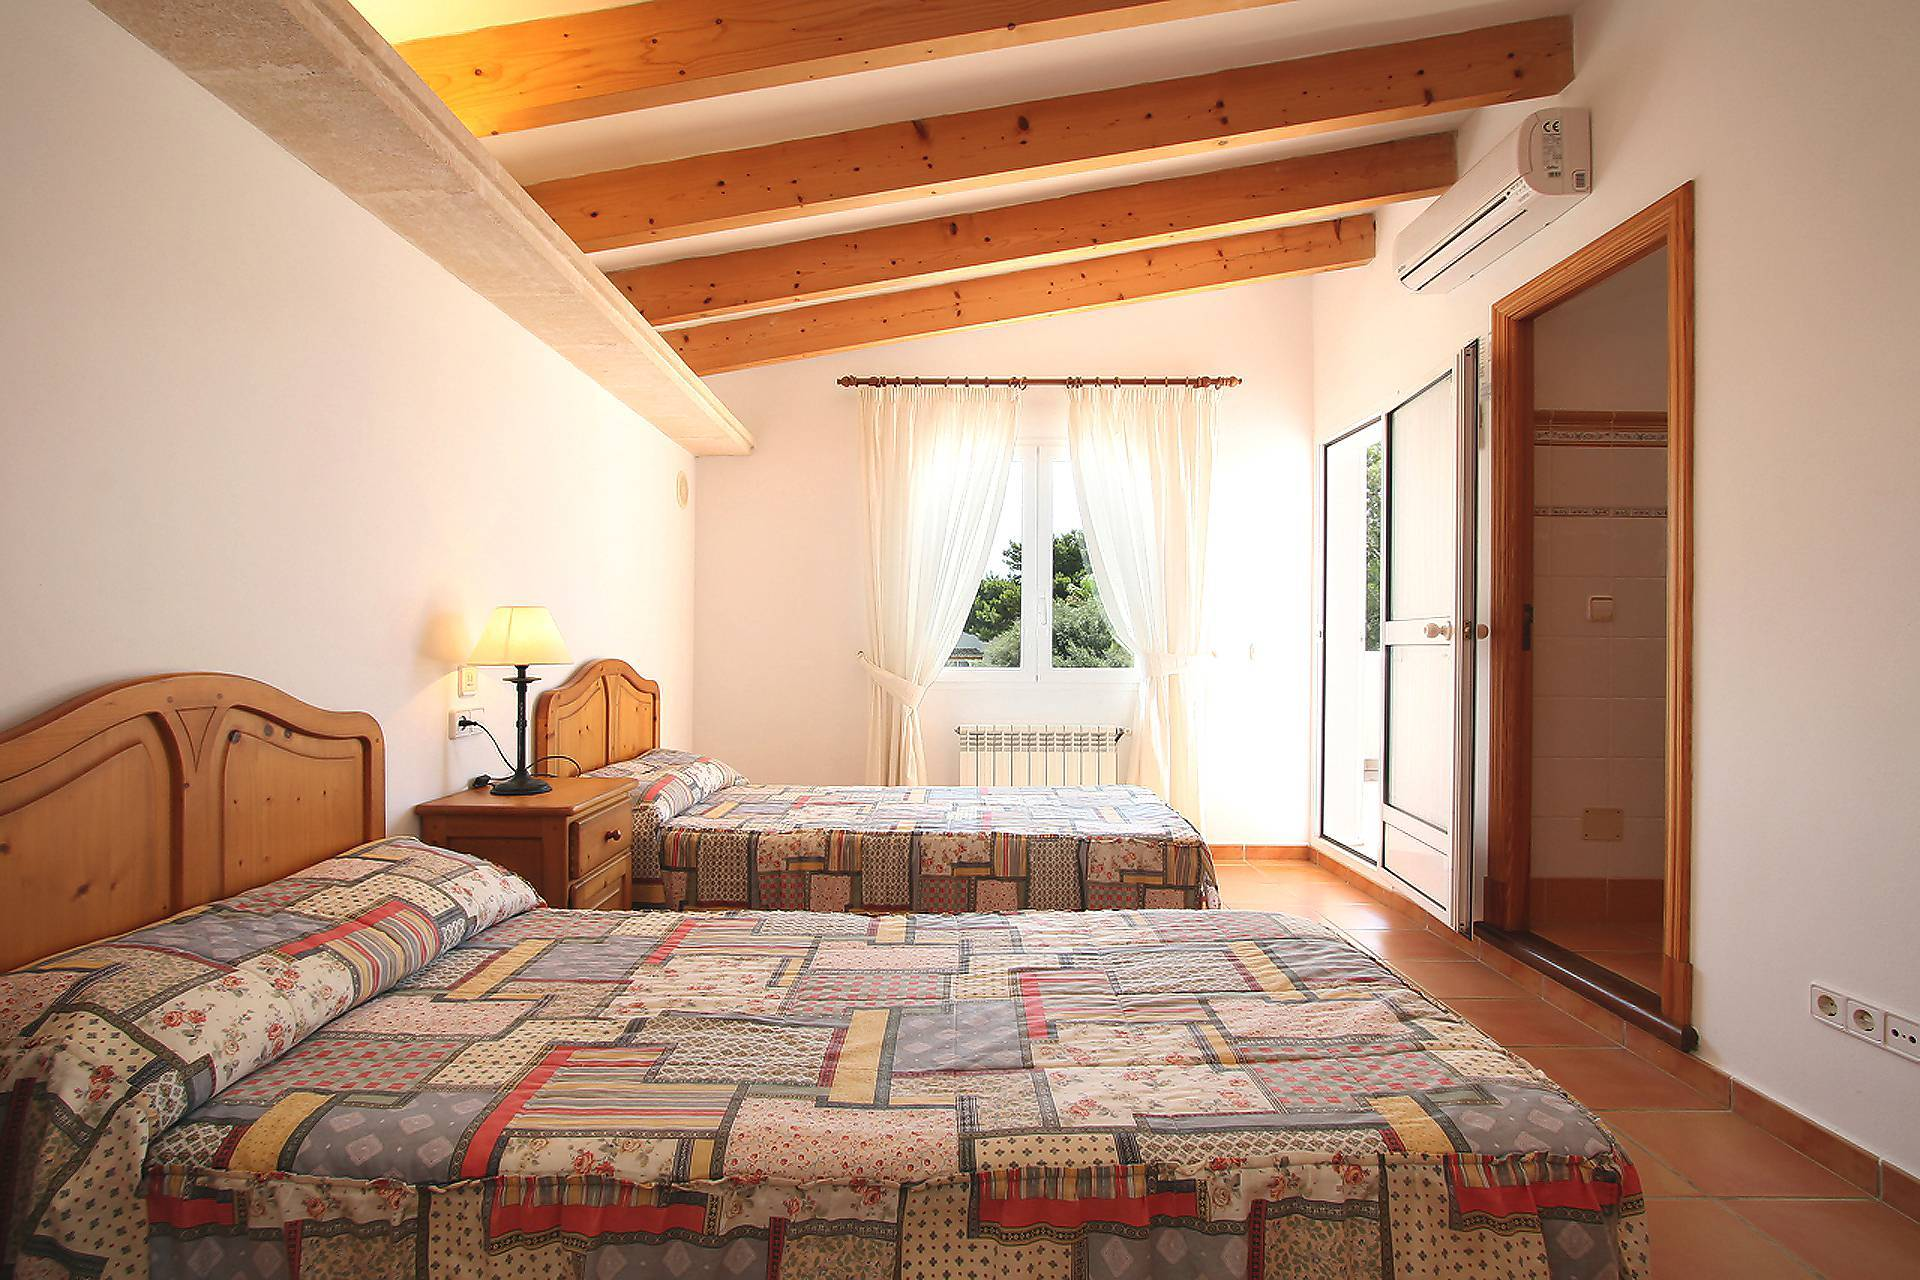 01-128 Rustic holiday home Majorca East Bild 13